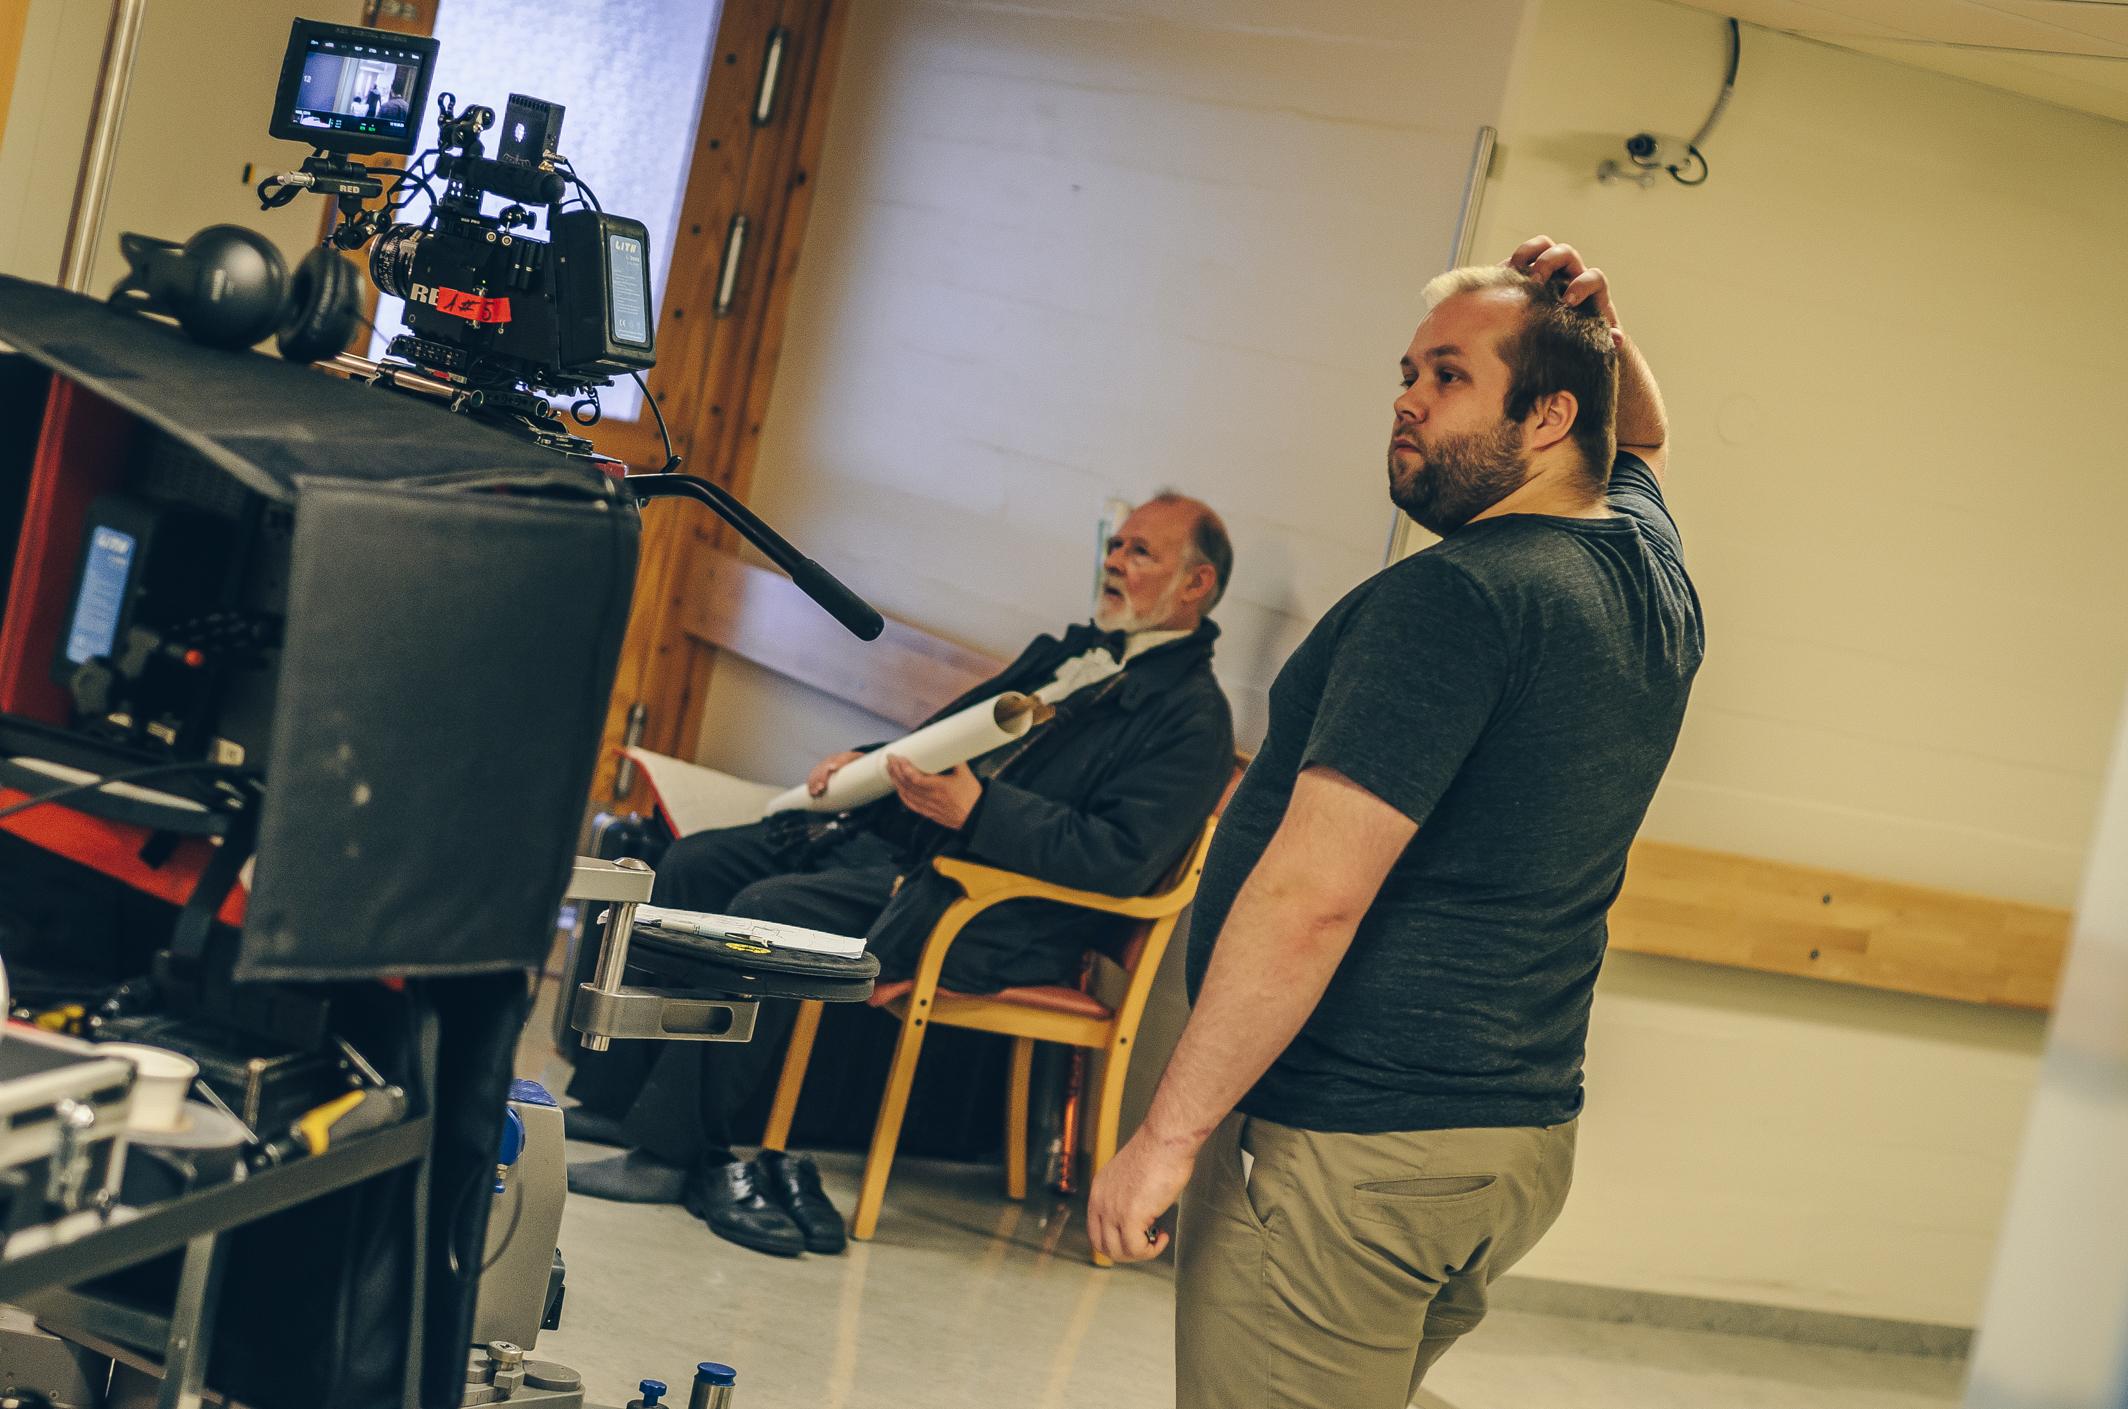 Eyþór in his natural habitat, on set. Working on Arnbjörn